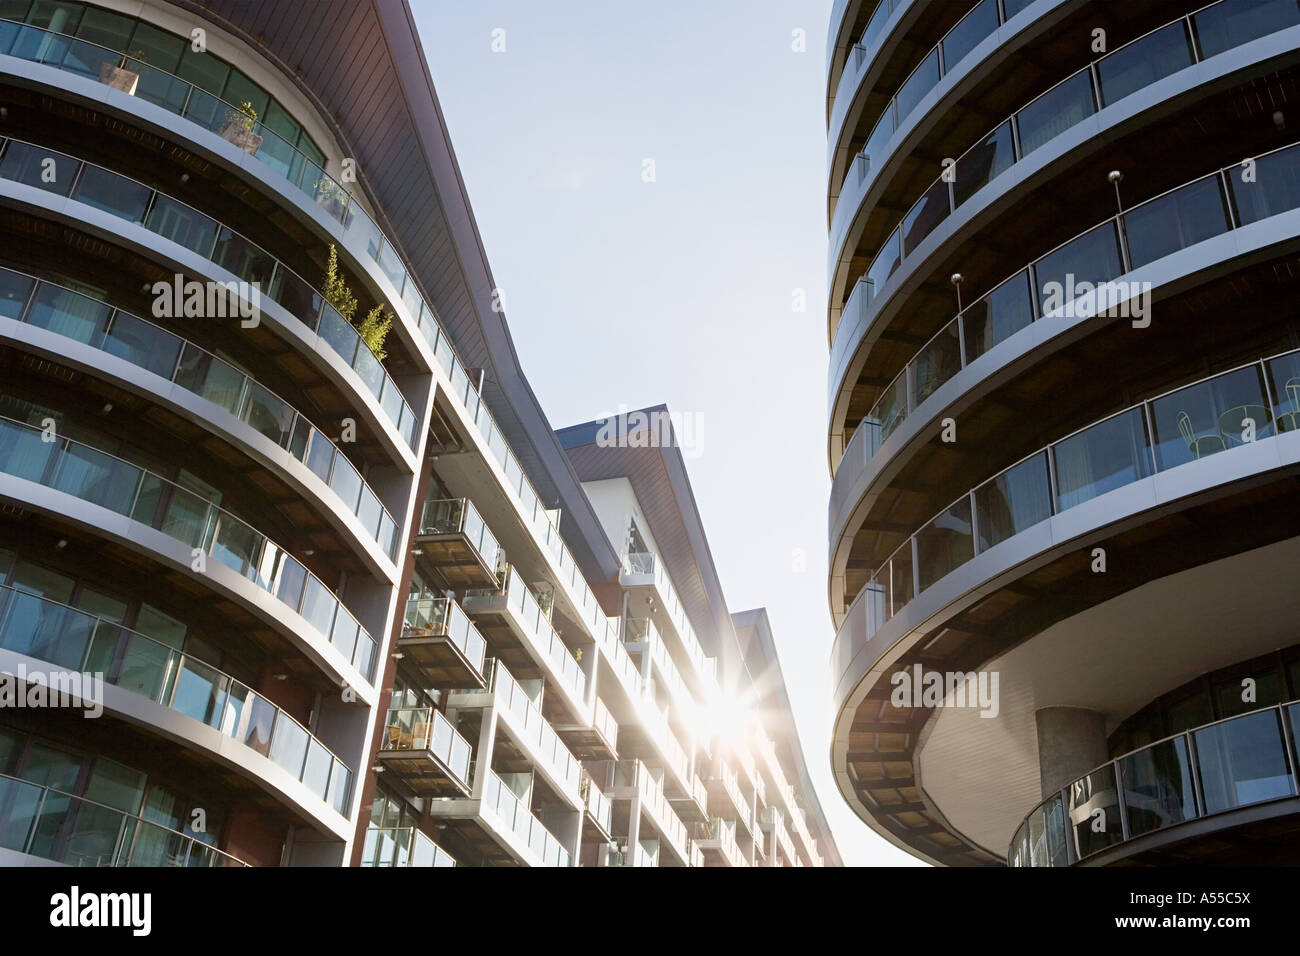 Modern apartment buildings - Stock Image